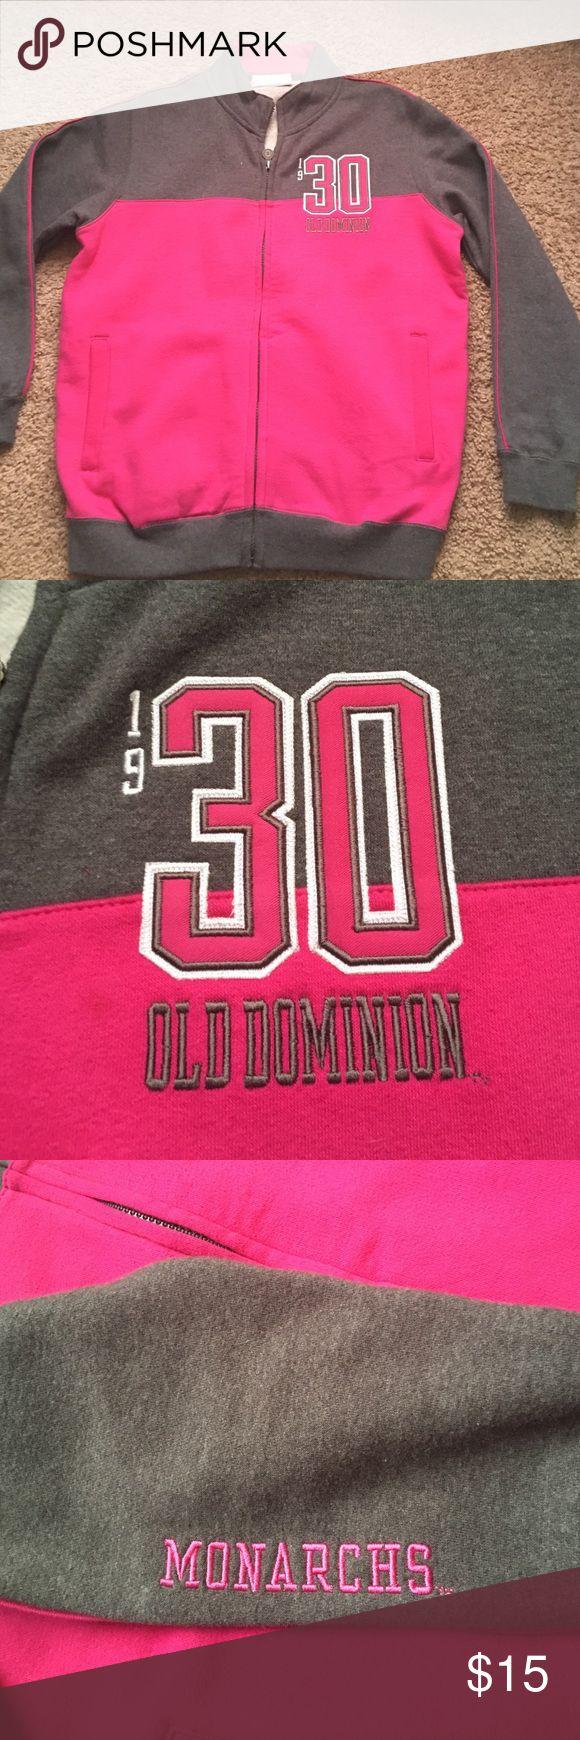 Letterman jacket Old Dominion University letterman jacket! Never been worn. Kids XL! Make me an offer 😊 Champion Jackets & Coats Utility Jackets